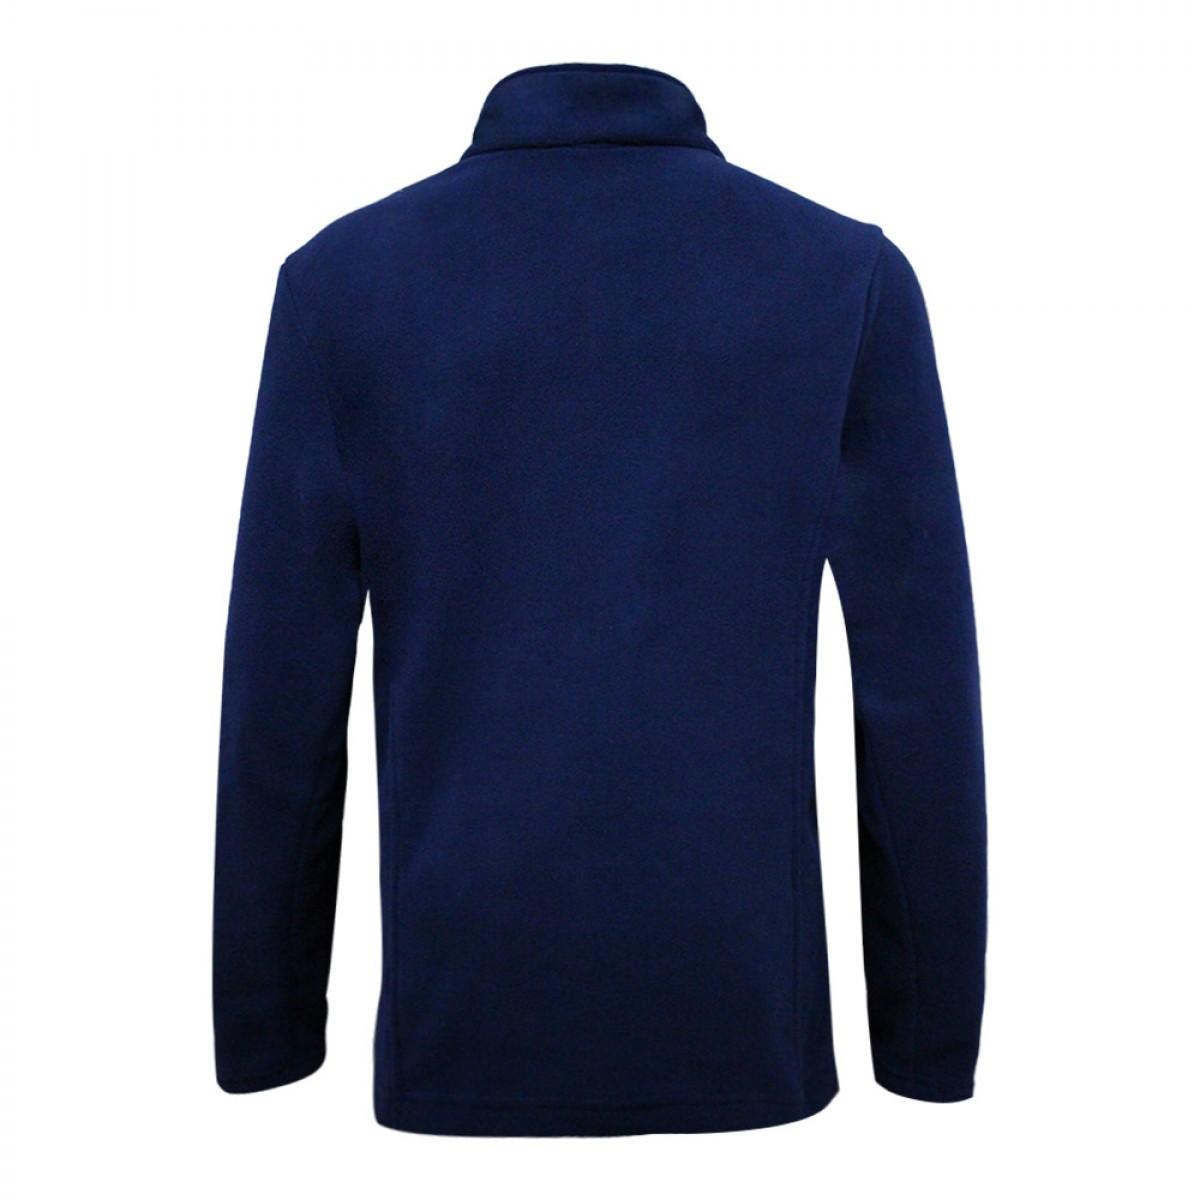 8848-women-thick-fleece-jacket-kfj06850-5a